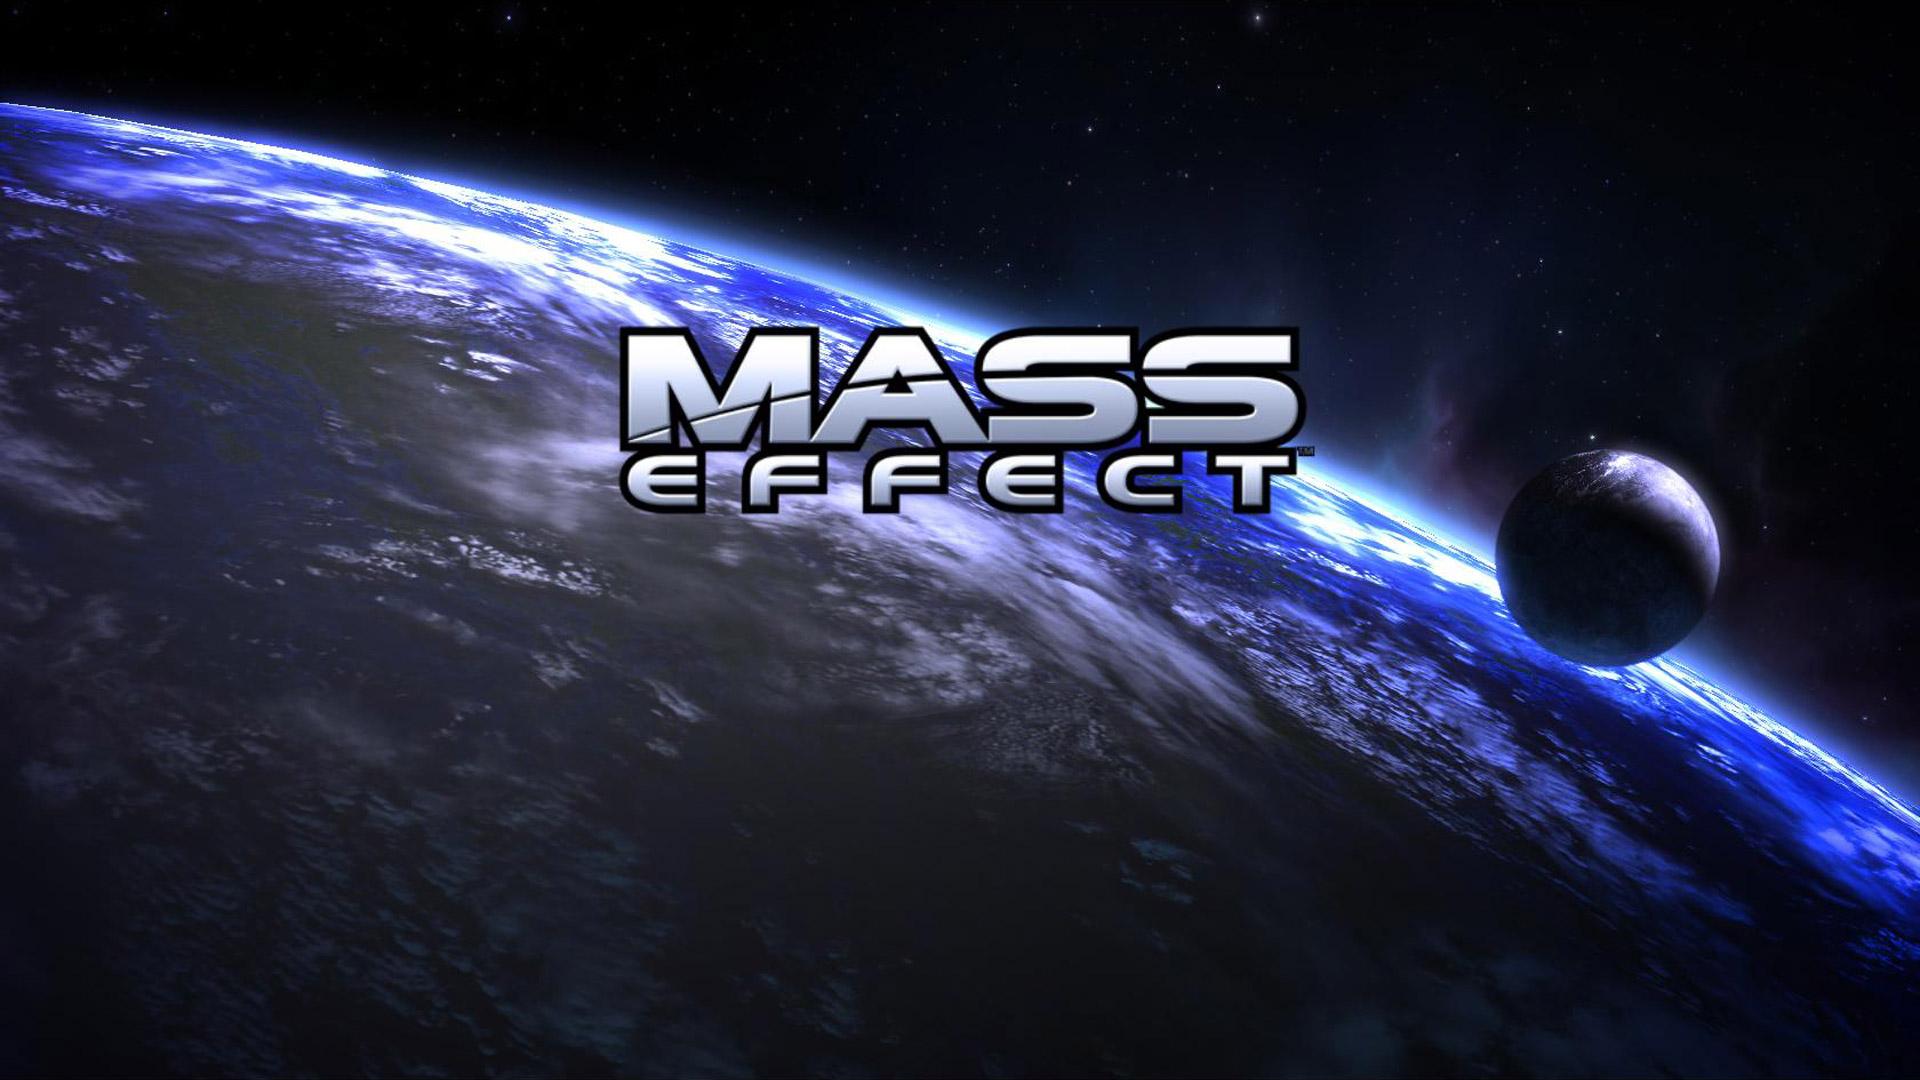 Free Mass Effect Wallpaper in 1920x1080